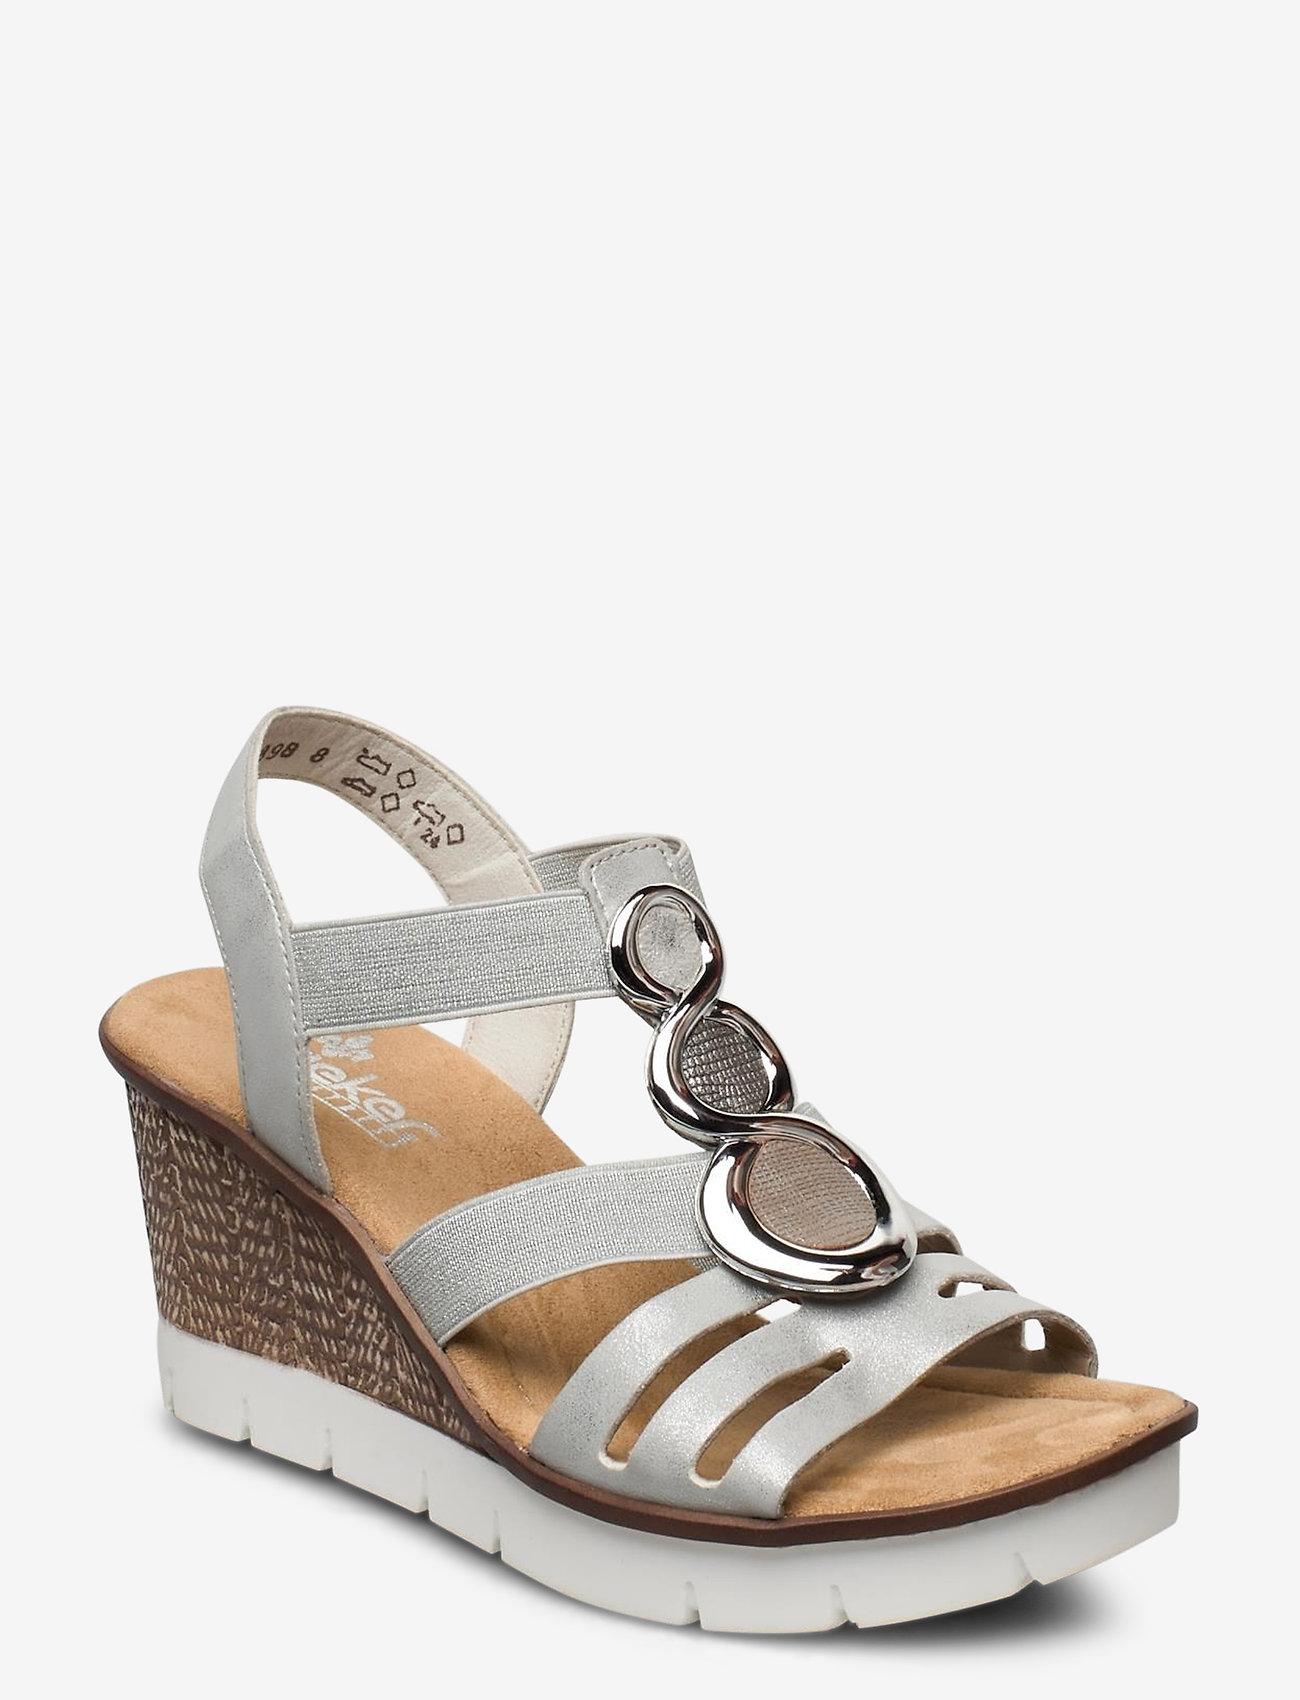 Rieker - 65540-40 - heeled sandals - grey